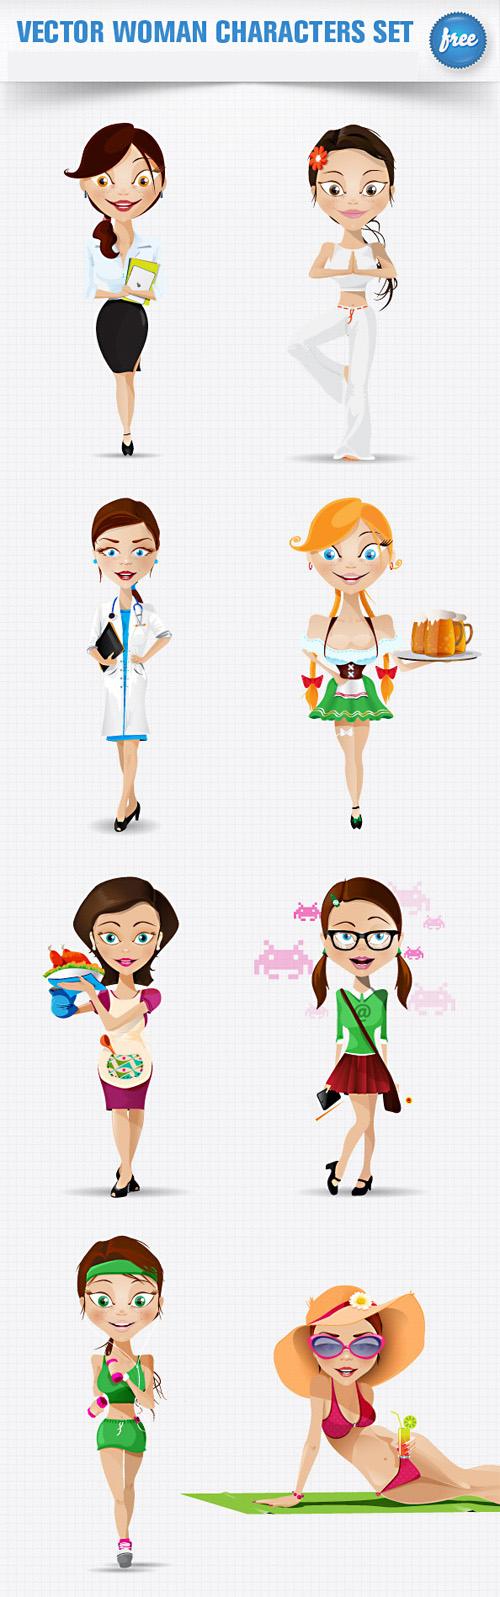 Woman Characters Set - PSD Layered